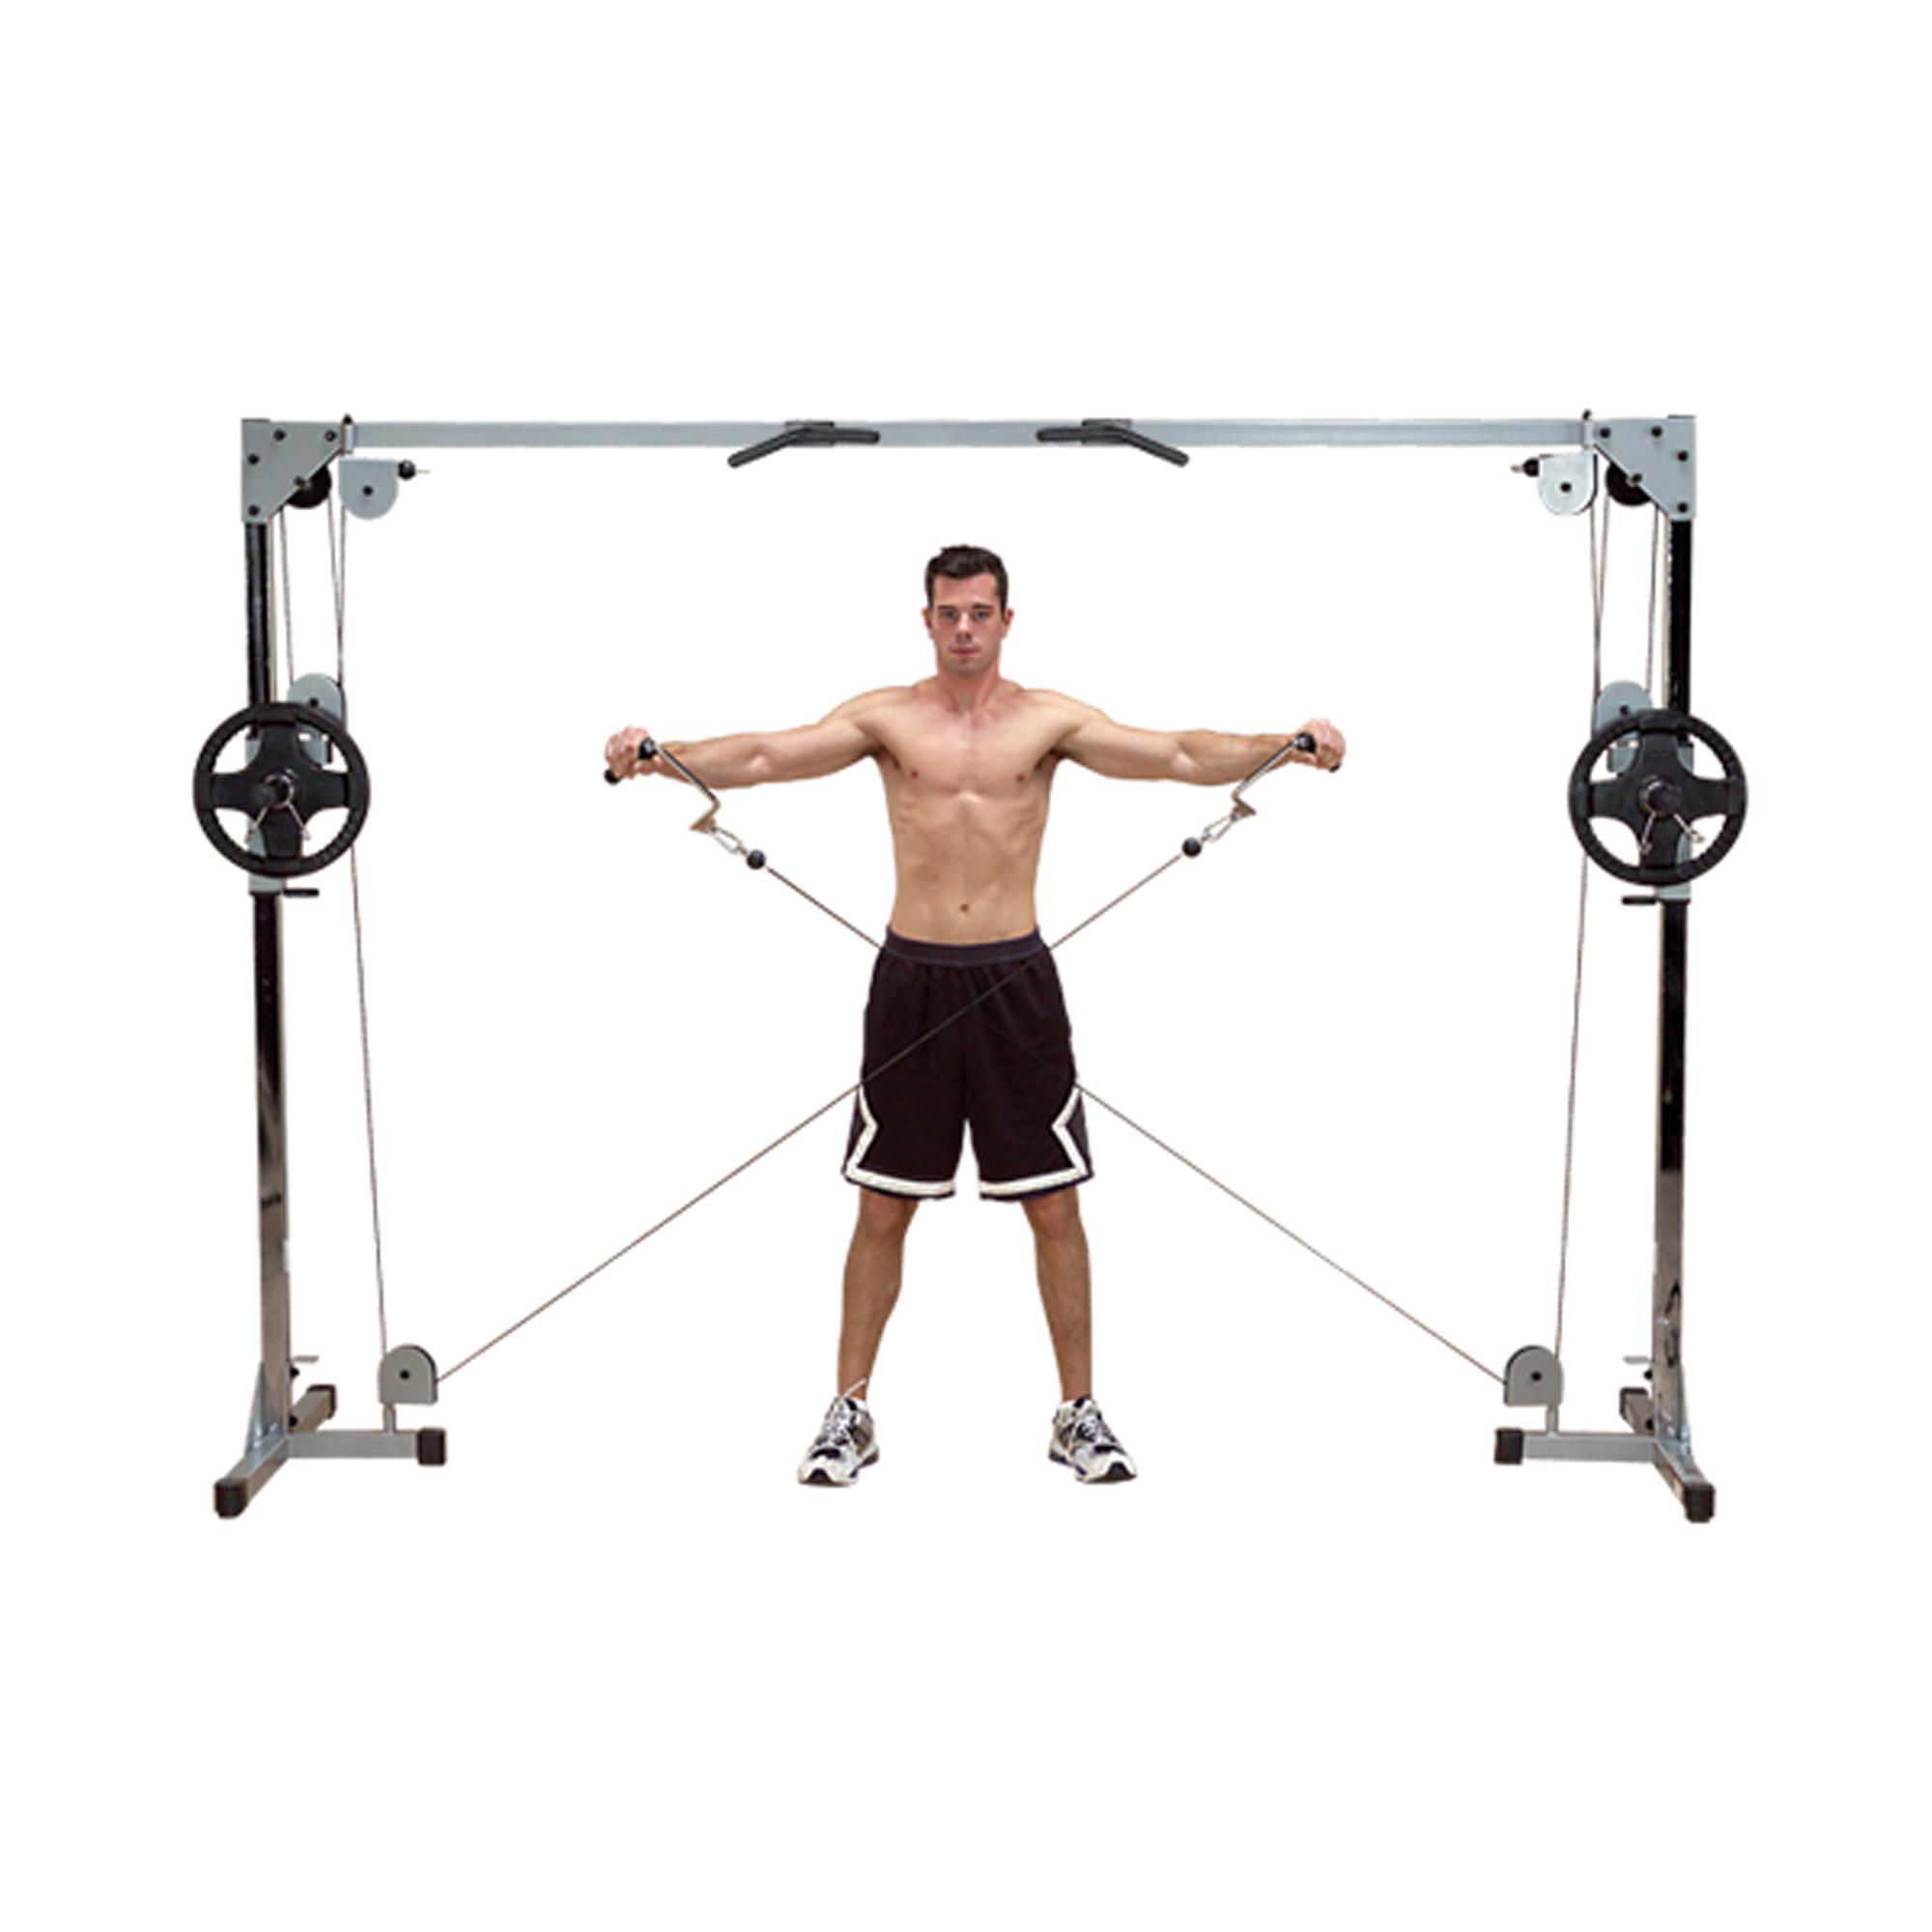 how to find machine part in cerulean gym